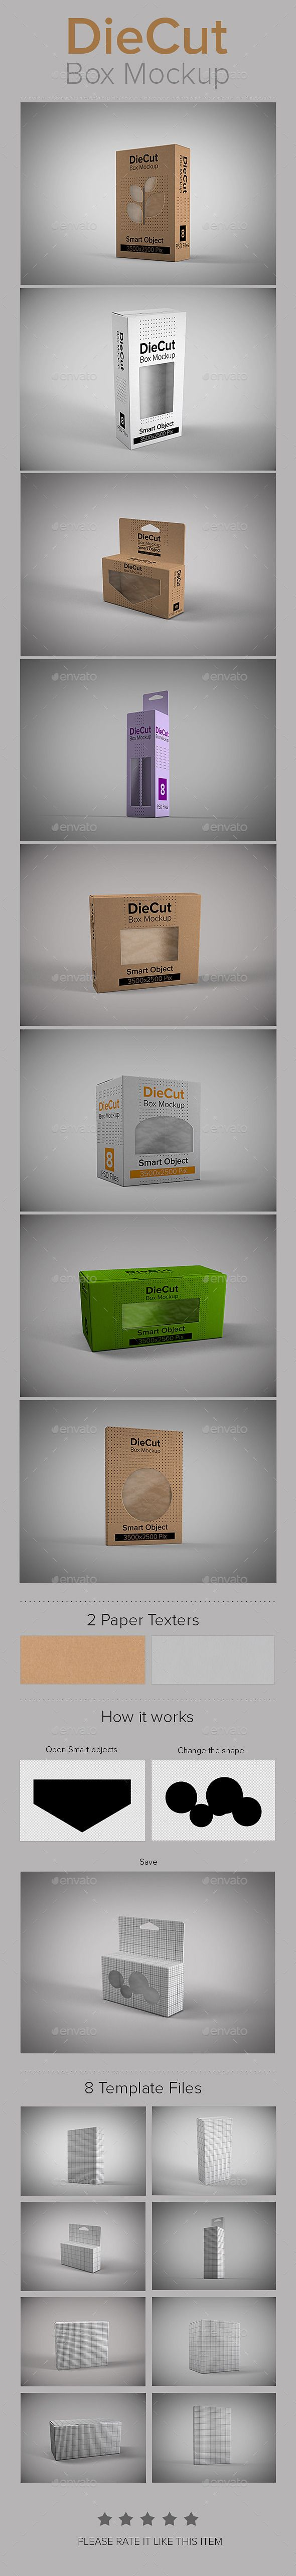 Diecut Box Mockup Boxmockup Download Http Graphicriver Net Item Diecut Box Mockup 9083428 Ref Ksioks Box Mockup Mockup Tool Design